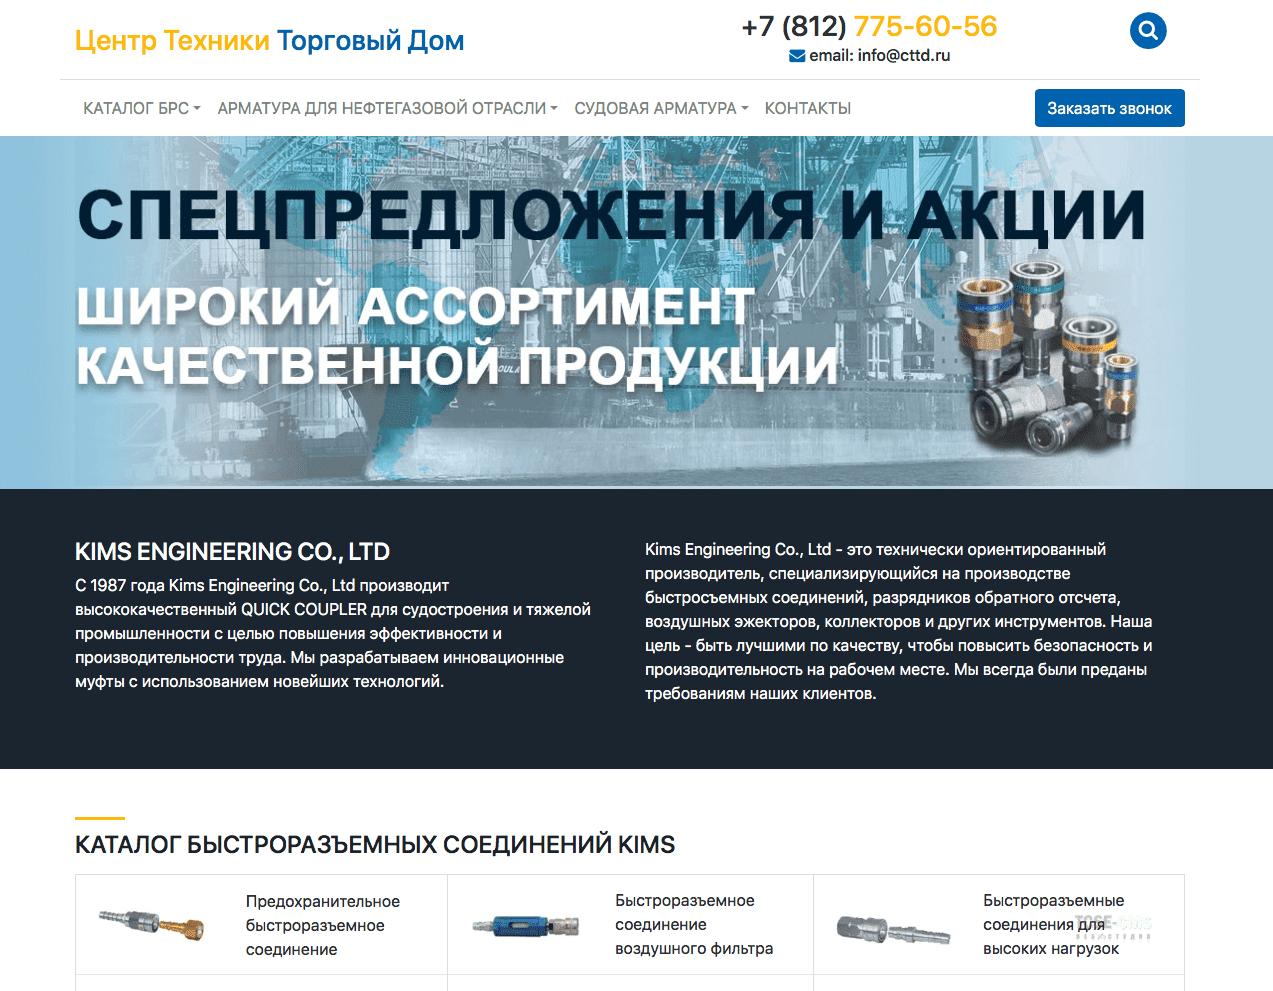 cttd.ru - Каталог арматуры для нефтегазовой отрасли